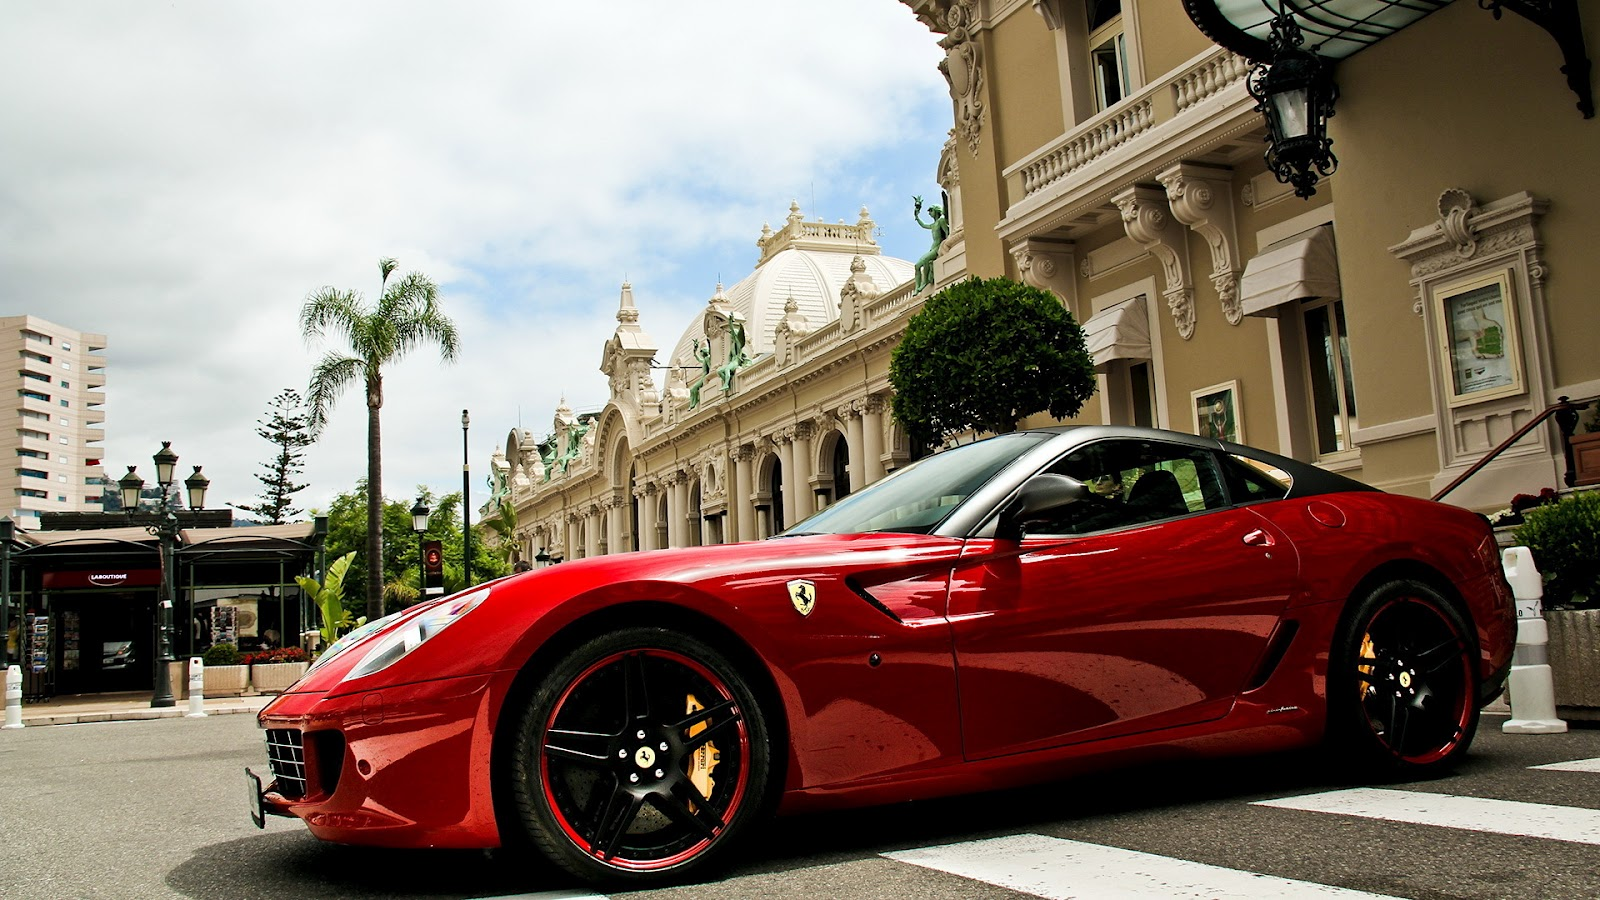 http://1.bp.blogspot.com/-Zv0e1WKLg_w/T8WqLtcsstI/AAAAAAAAeTM/izHYrKpIddw/s1600/Ferrari-599-GTO_Wallpapers-1080p-de-Carros.jpg